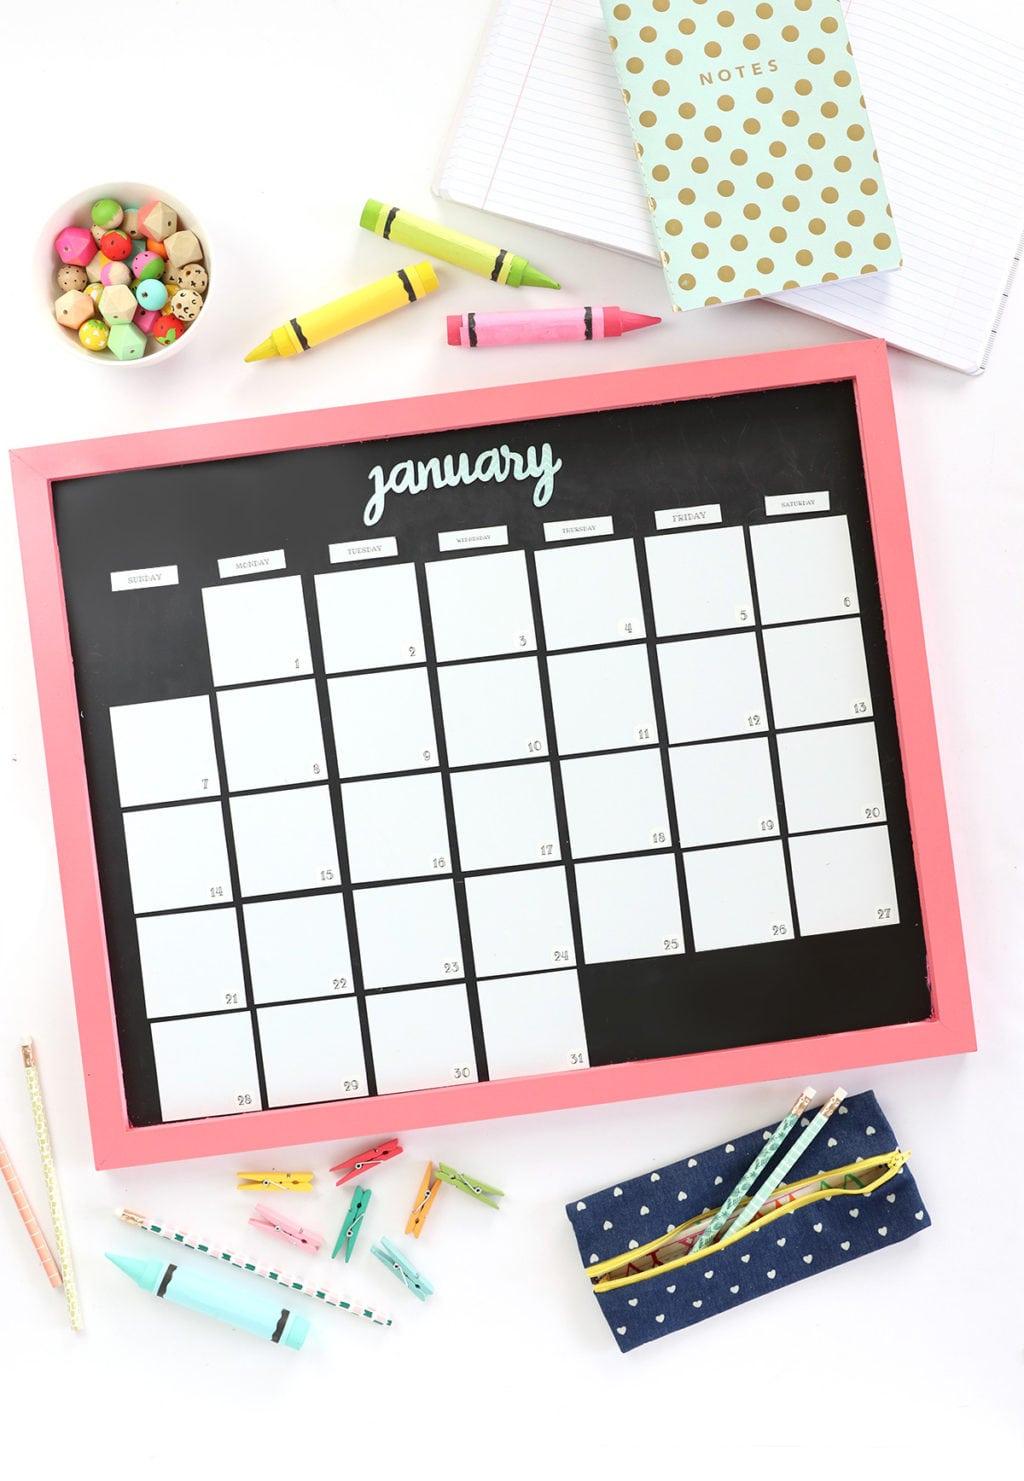 Diy Calendar Magnets : Diy magnetic whiteboard calendar with dymo mobilelabeler